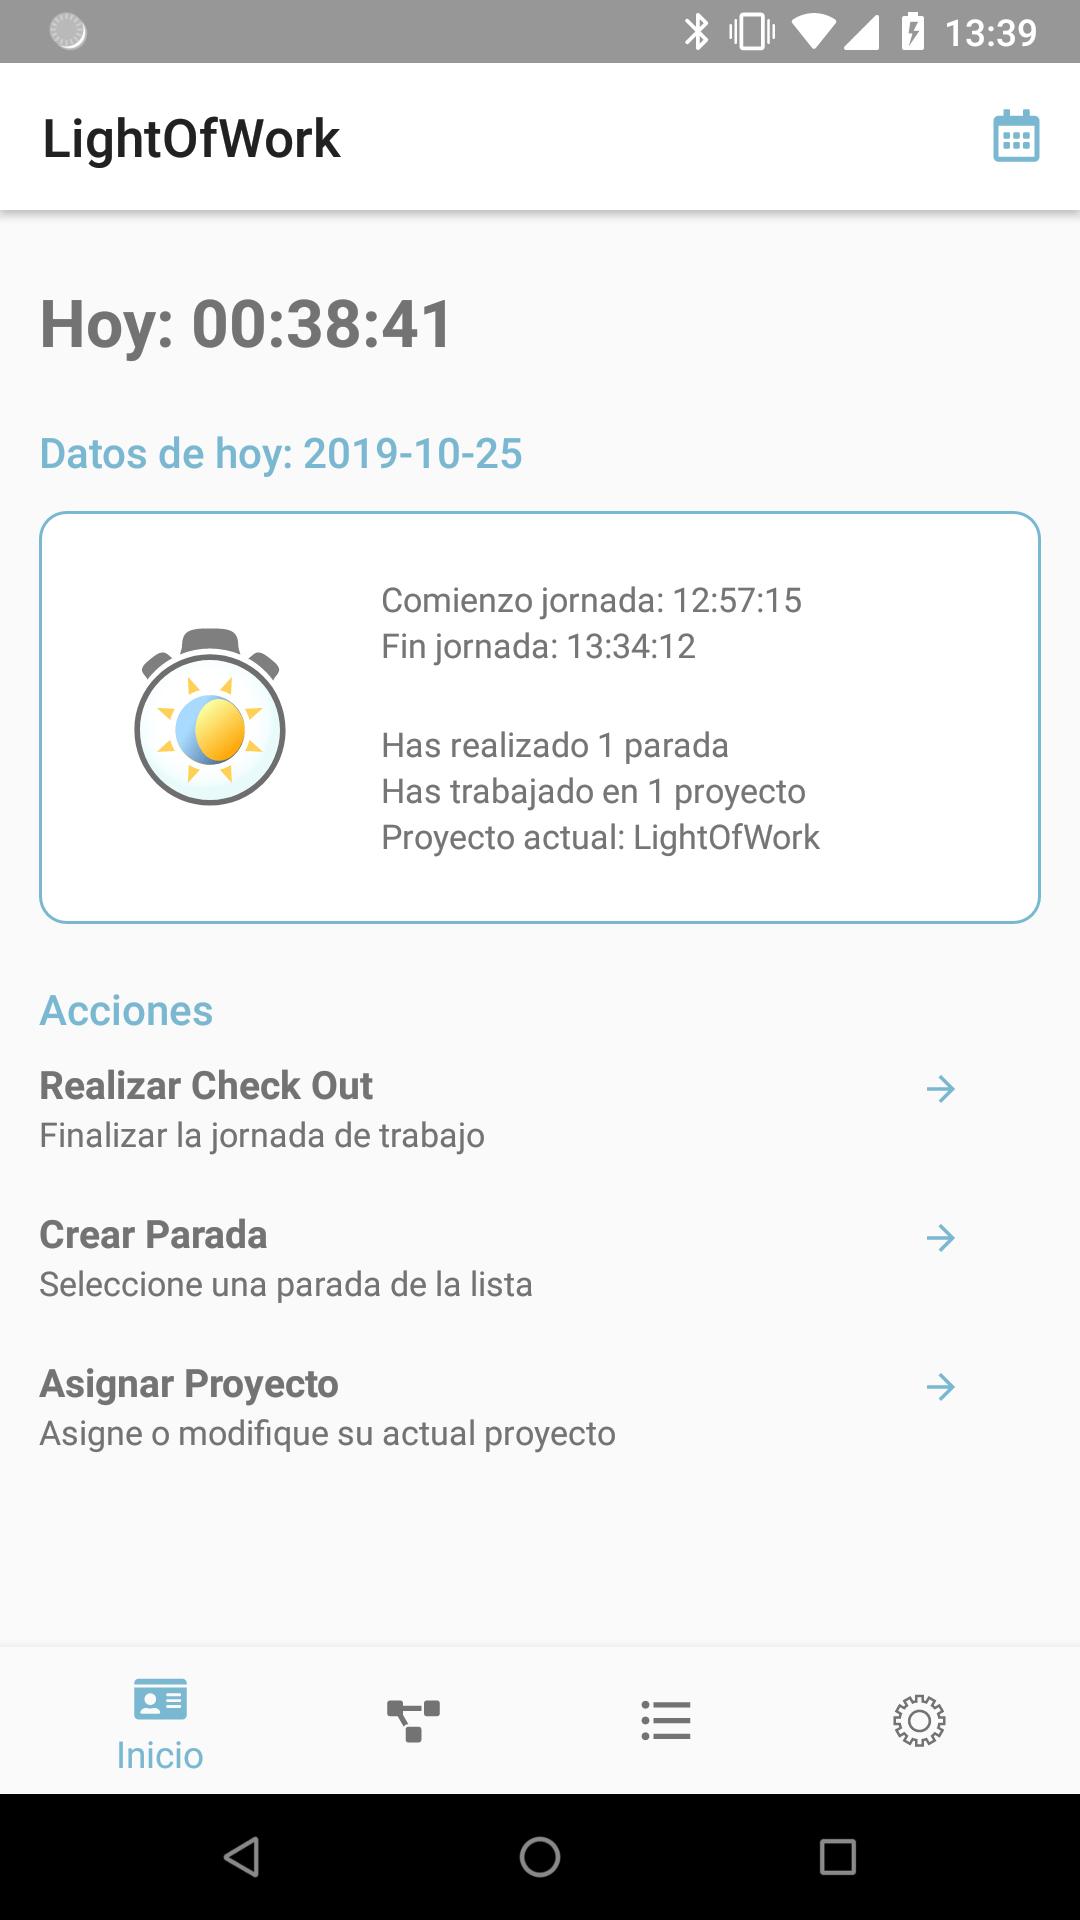 device-2019-10-25-133941